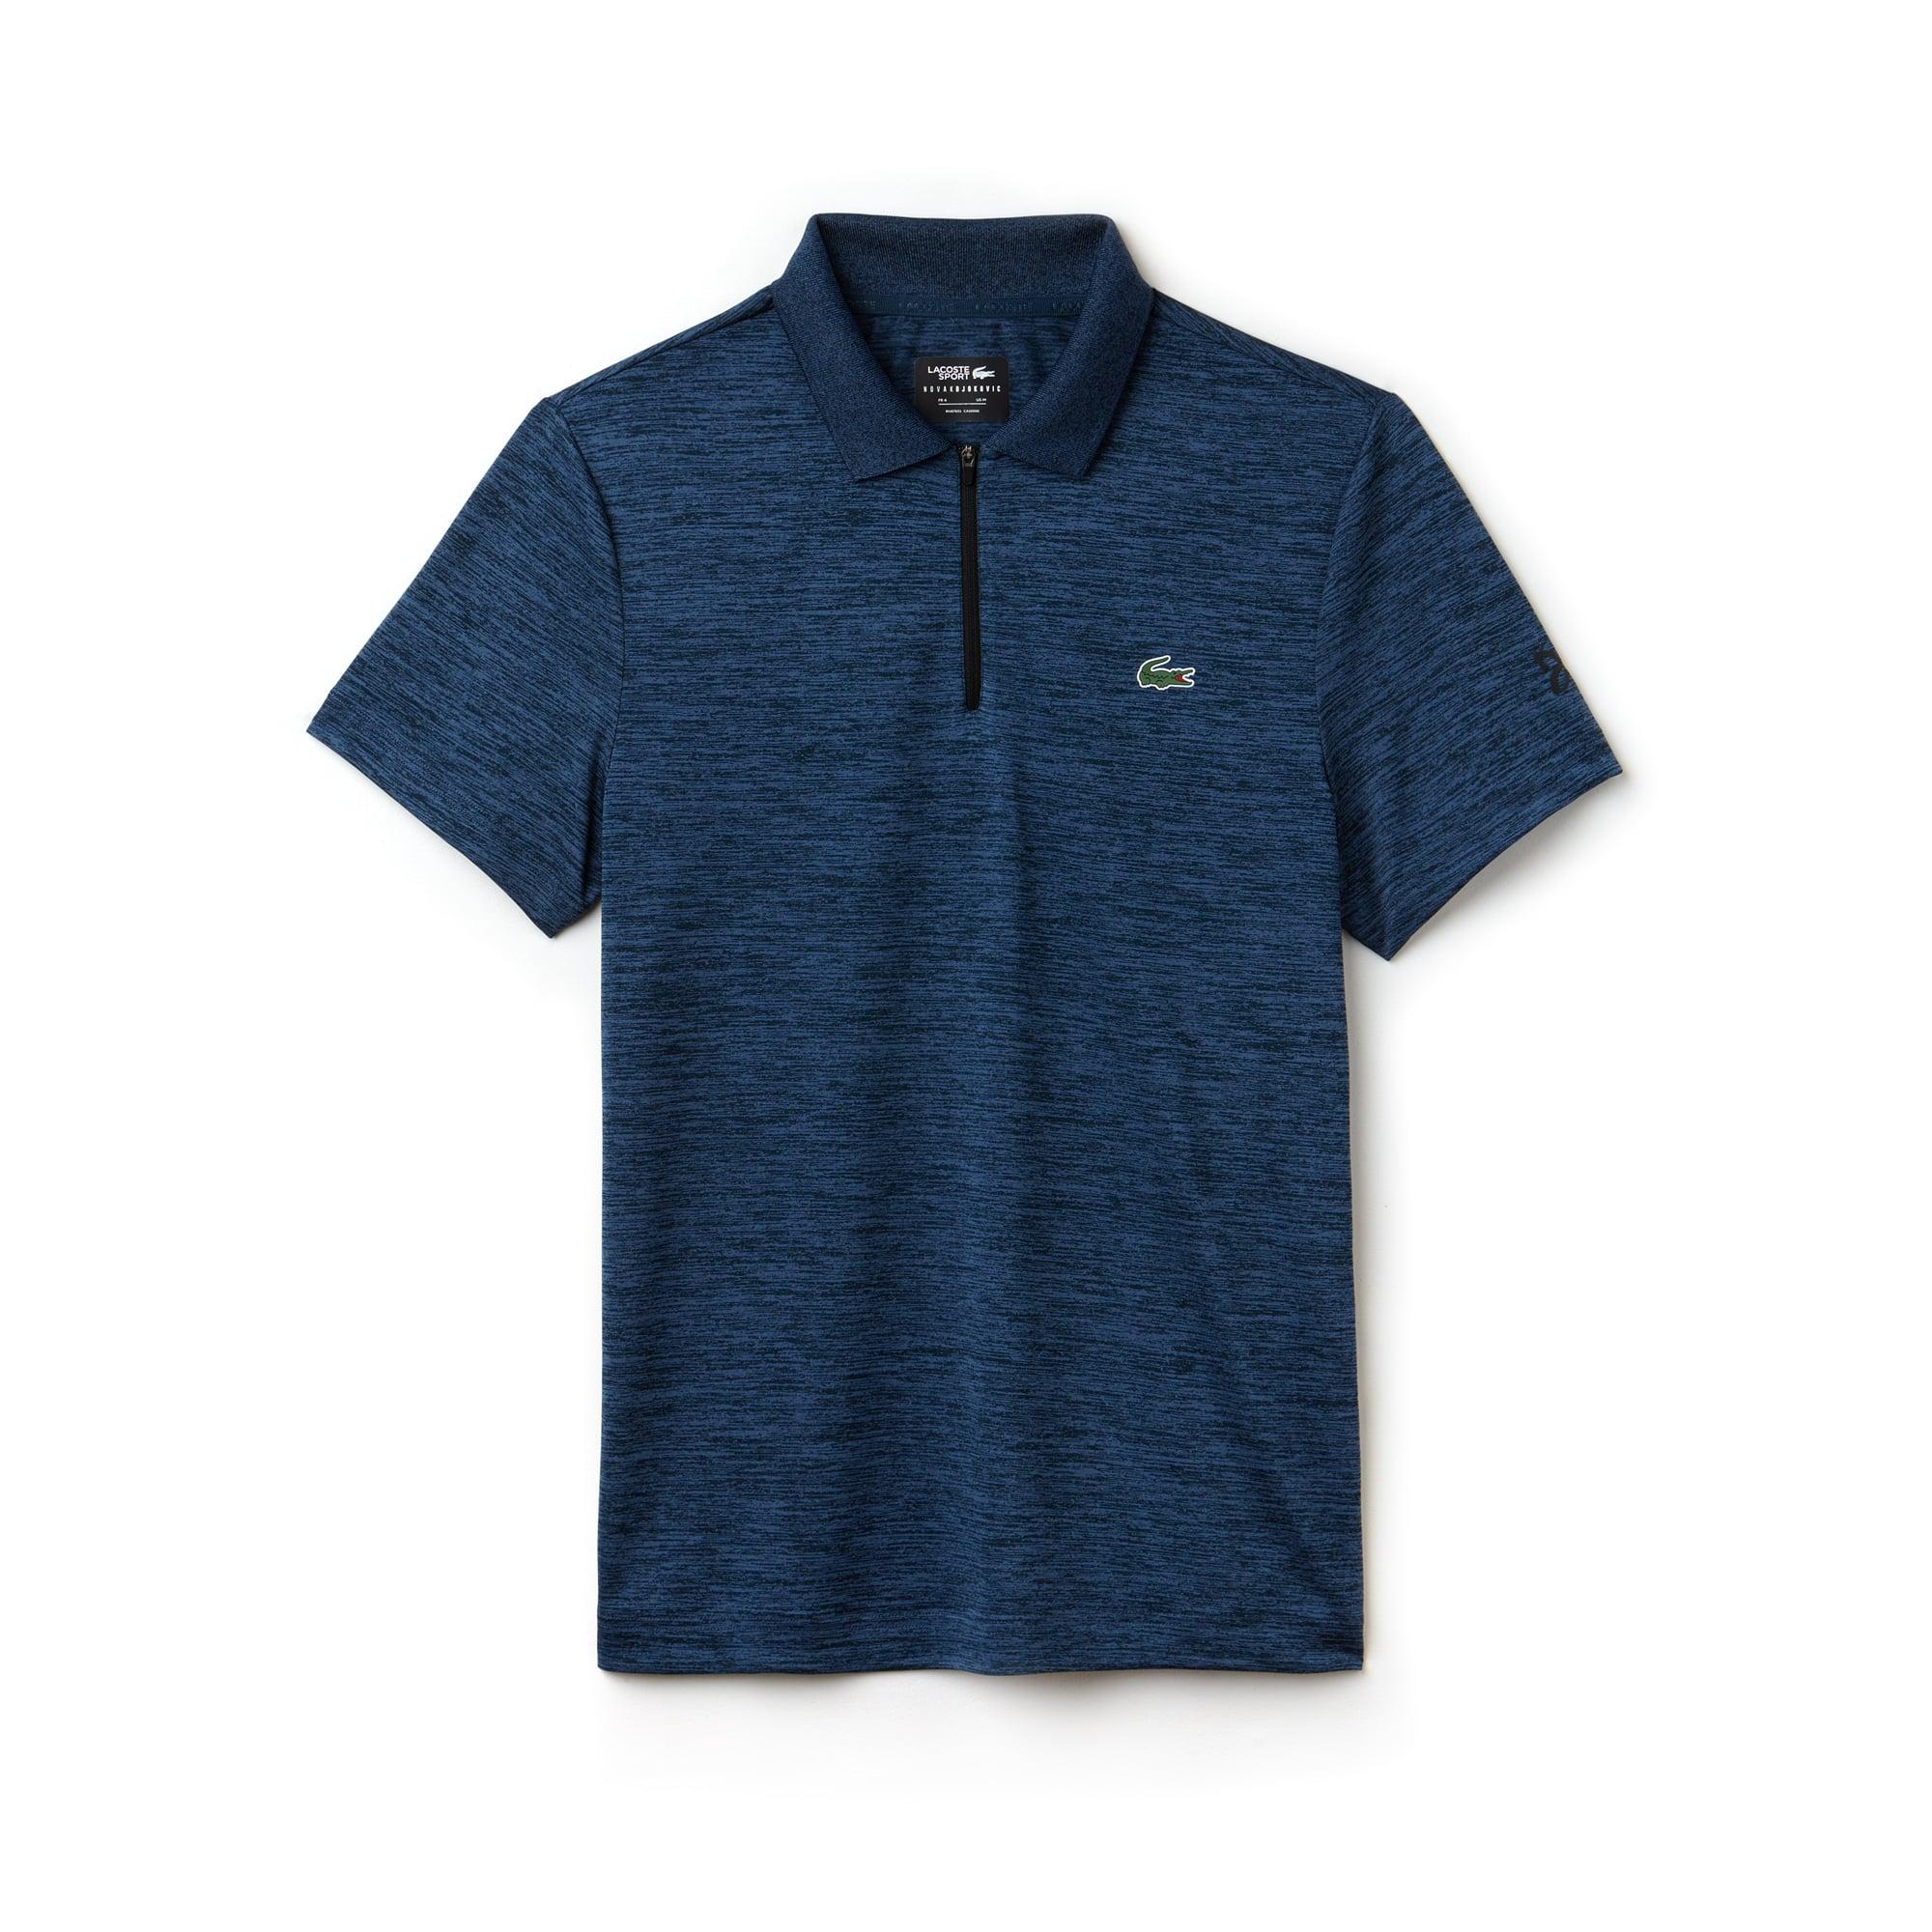 Men's SPORT Flecked Technical Jersey Polo -  x Novak Djokovic Off Court Premium Edition